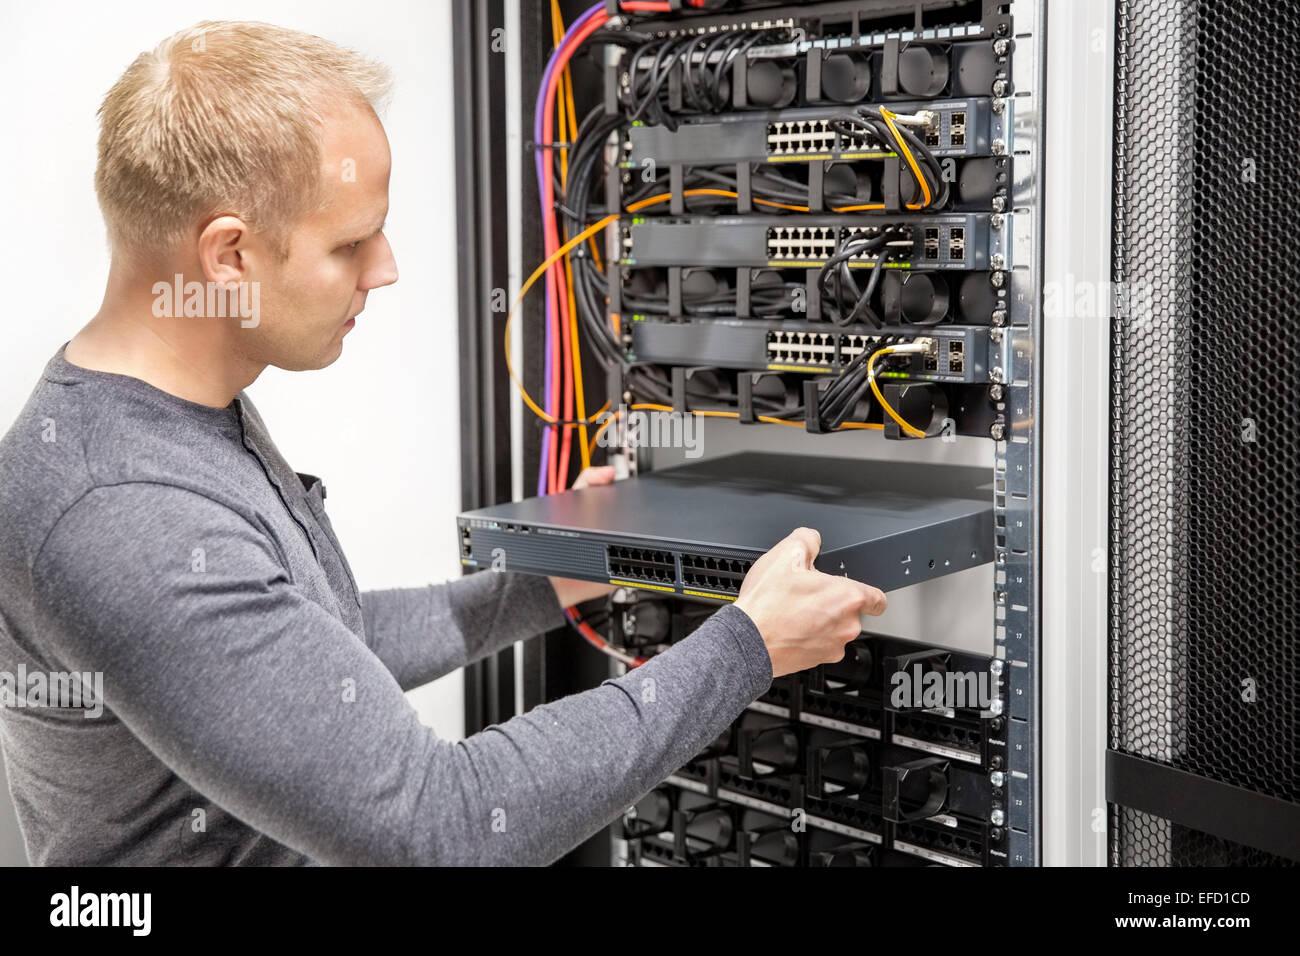 Server Racks In Data Center Stock Photos Rack Wiring Diagram It Consultant Build Network Datacenter Image